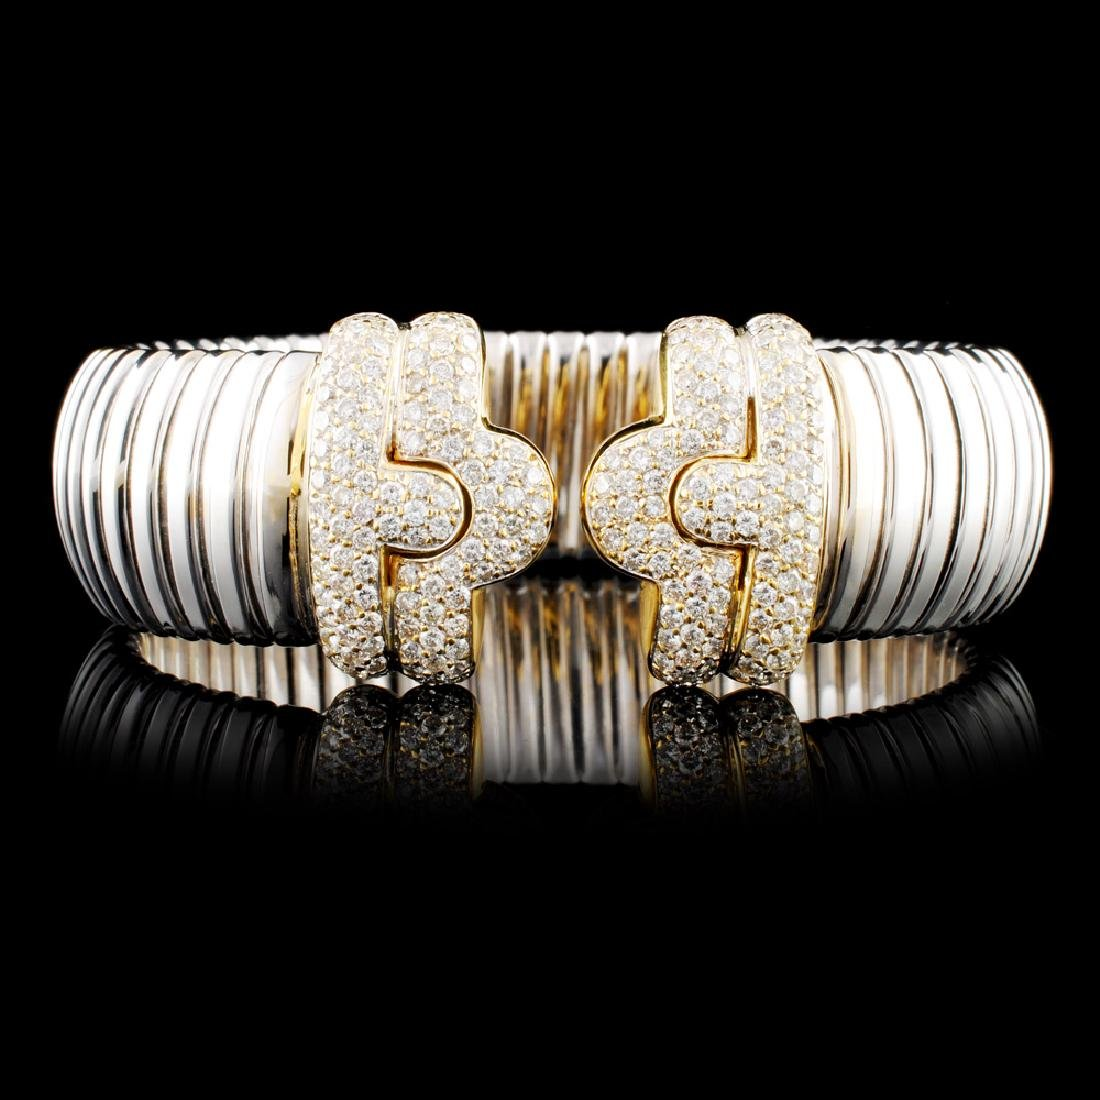 18K Gold 2.42ctw Diamond Bangle